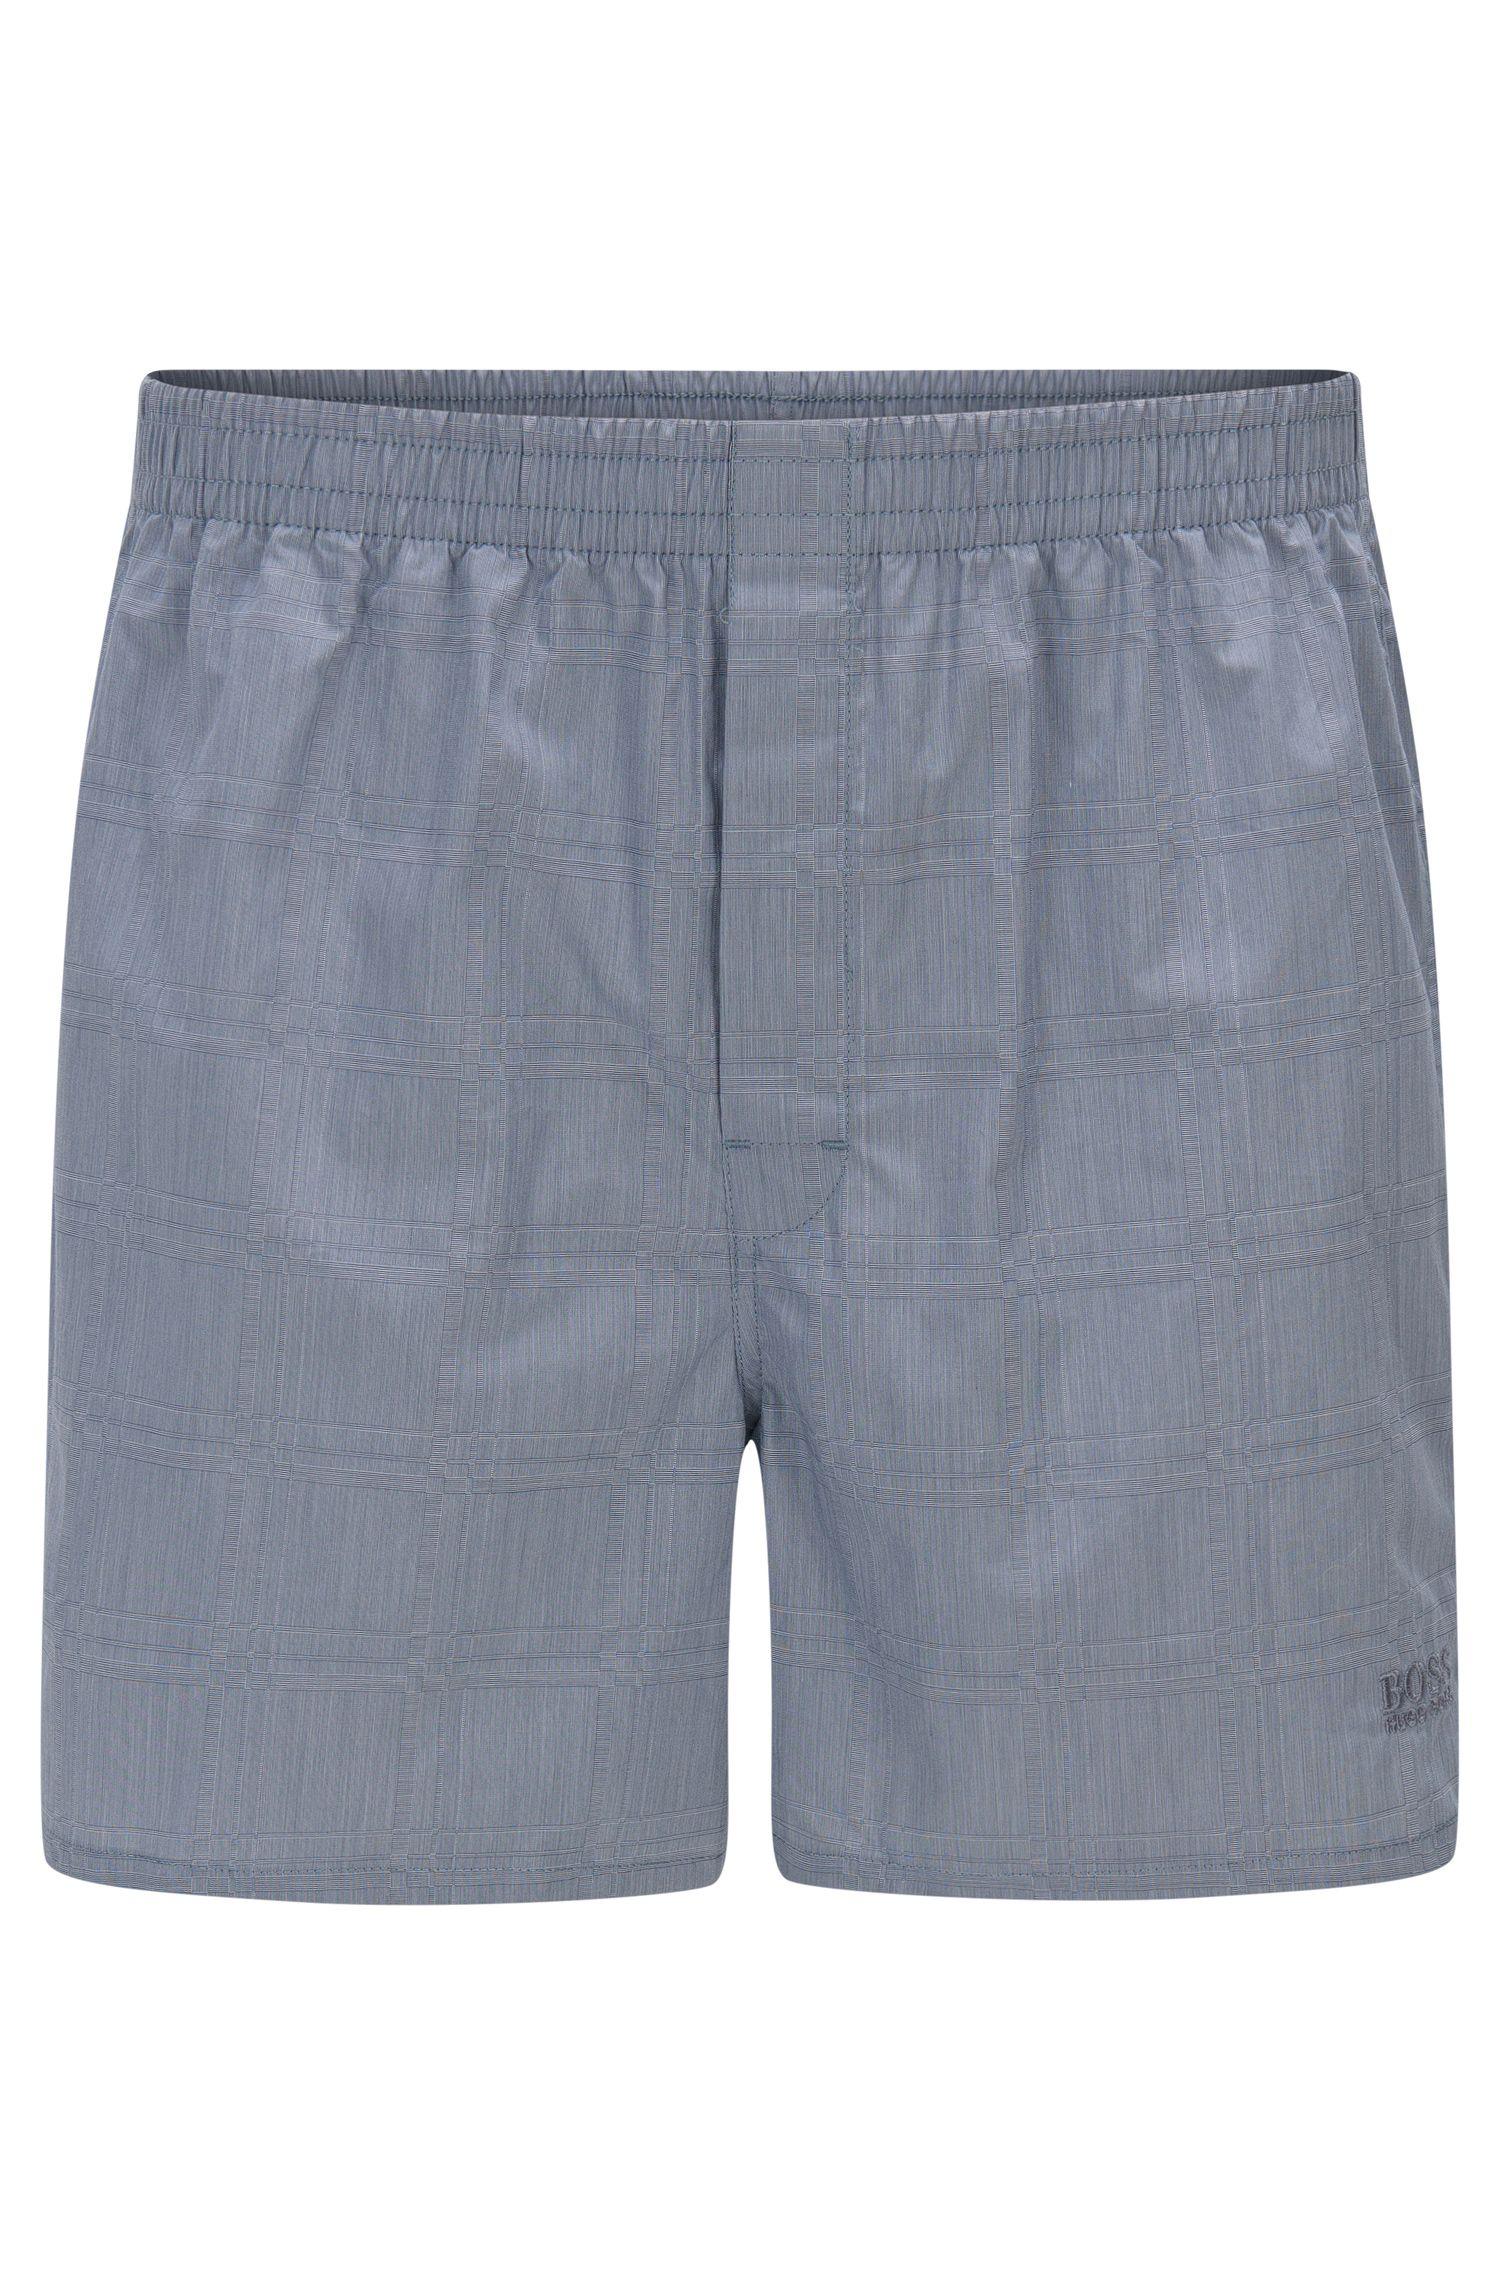 Fein gemusterte Regular-Fit Boxershorts aus Baumwolle: 'Boxer Short CW'